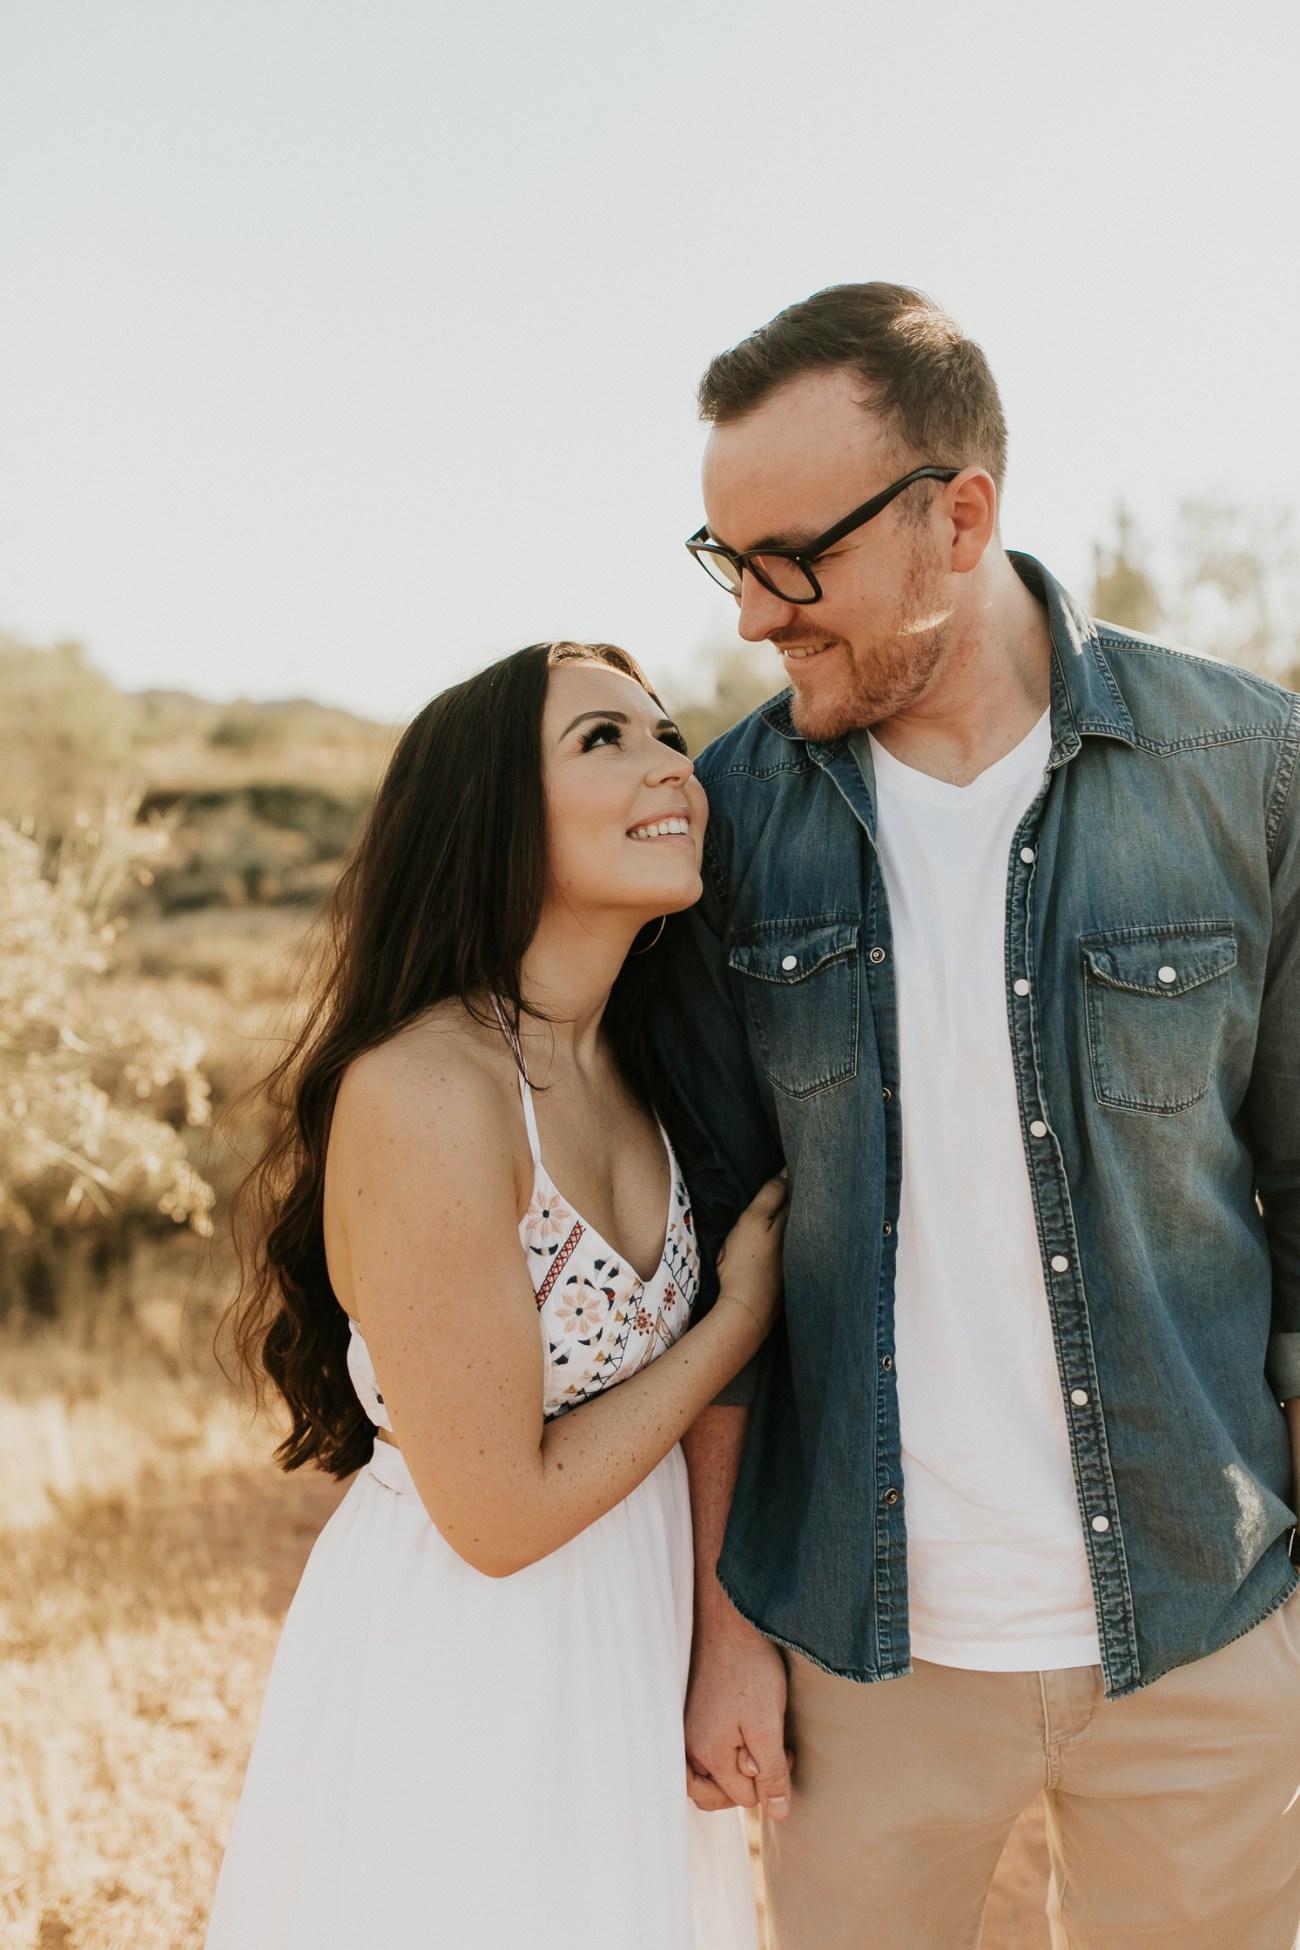 Megan Claire Photography   Arizona Wedding and Engagement Photographer.  arizona desert engagement session at sunset @meganclairephoto